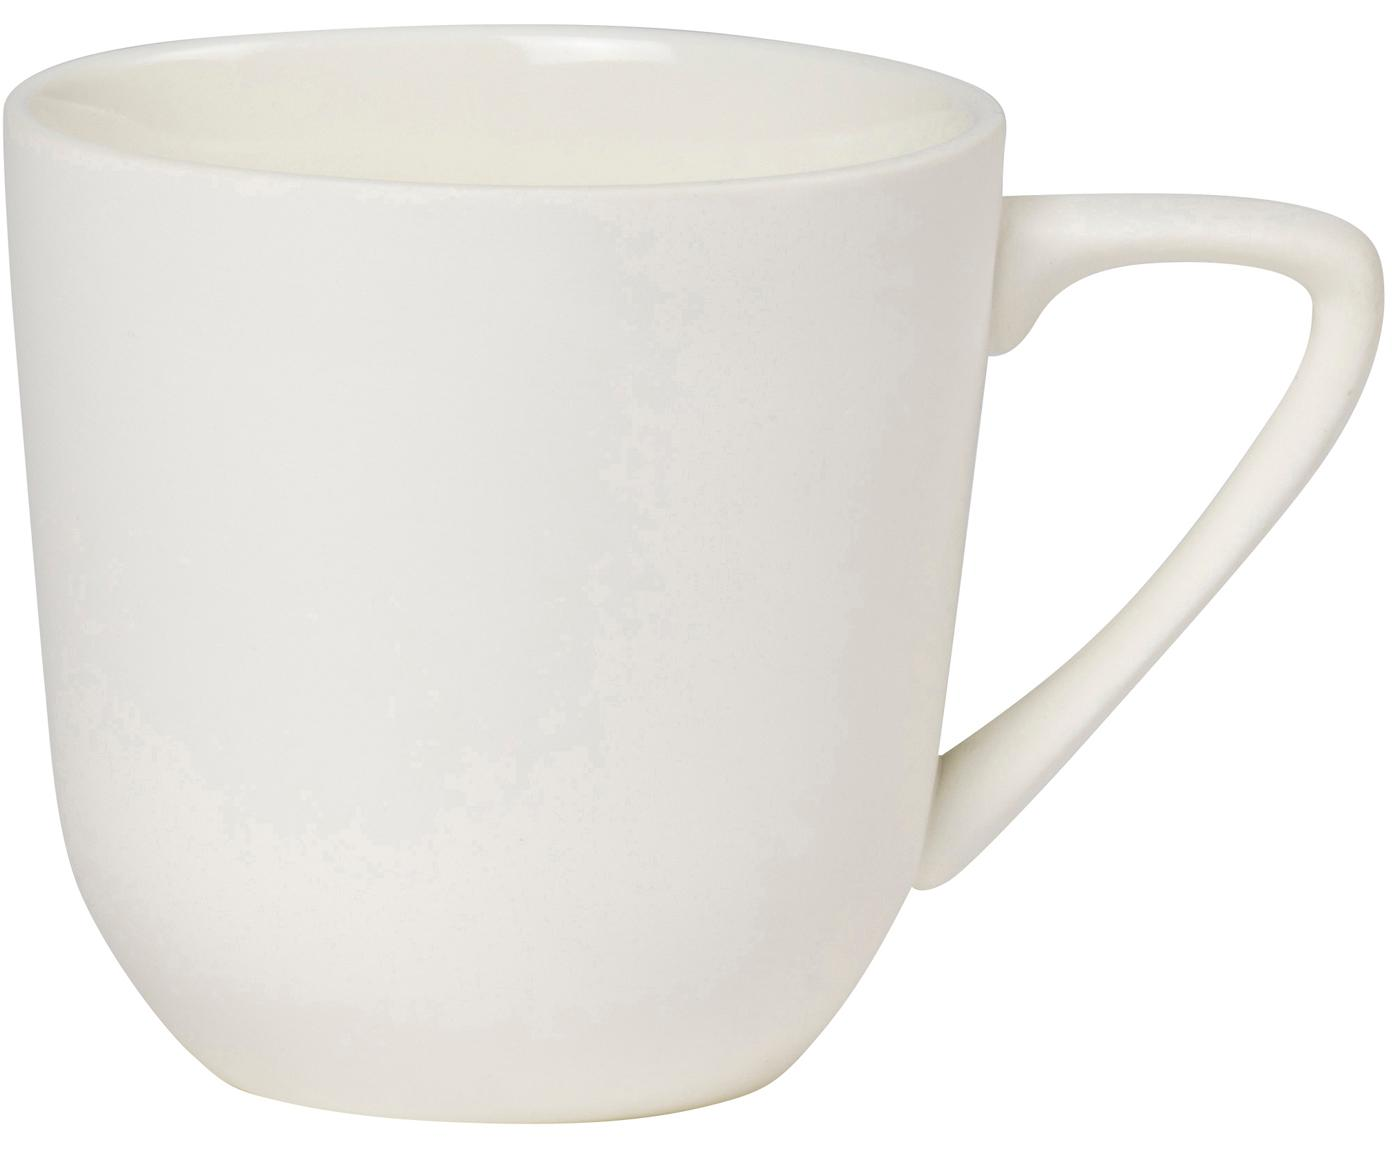 Tassen Nudge in Weiss matt/glänzend, 4 Stück, Porzellan, Creme, Ø 8 x H 8 cm